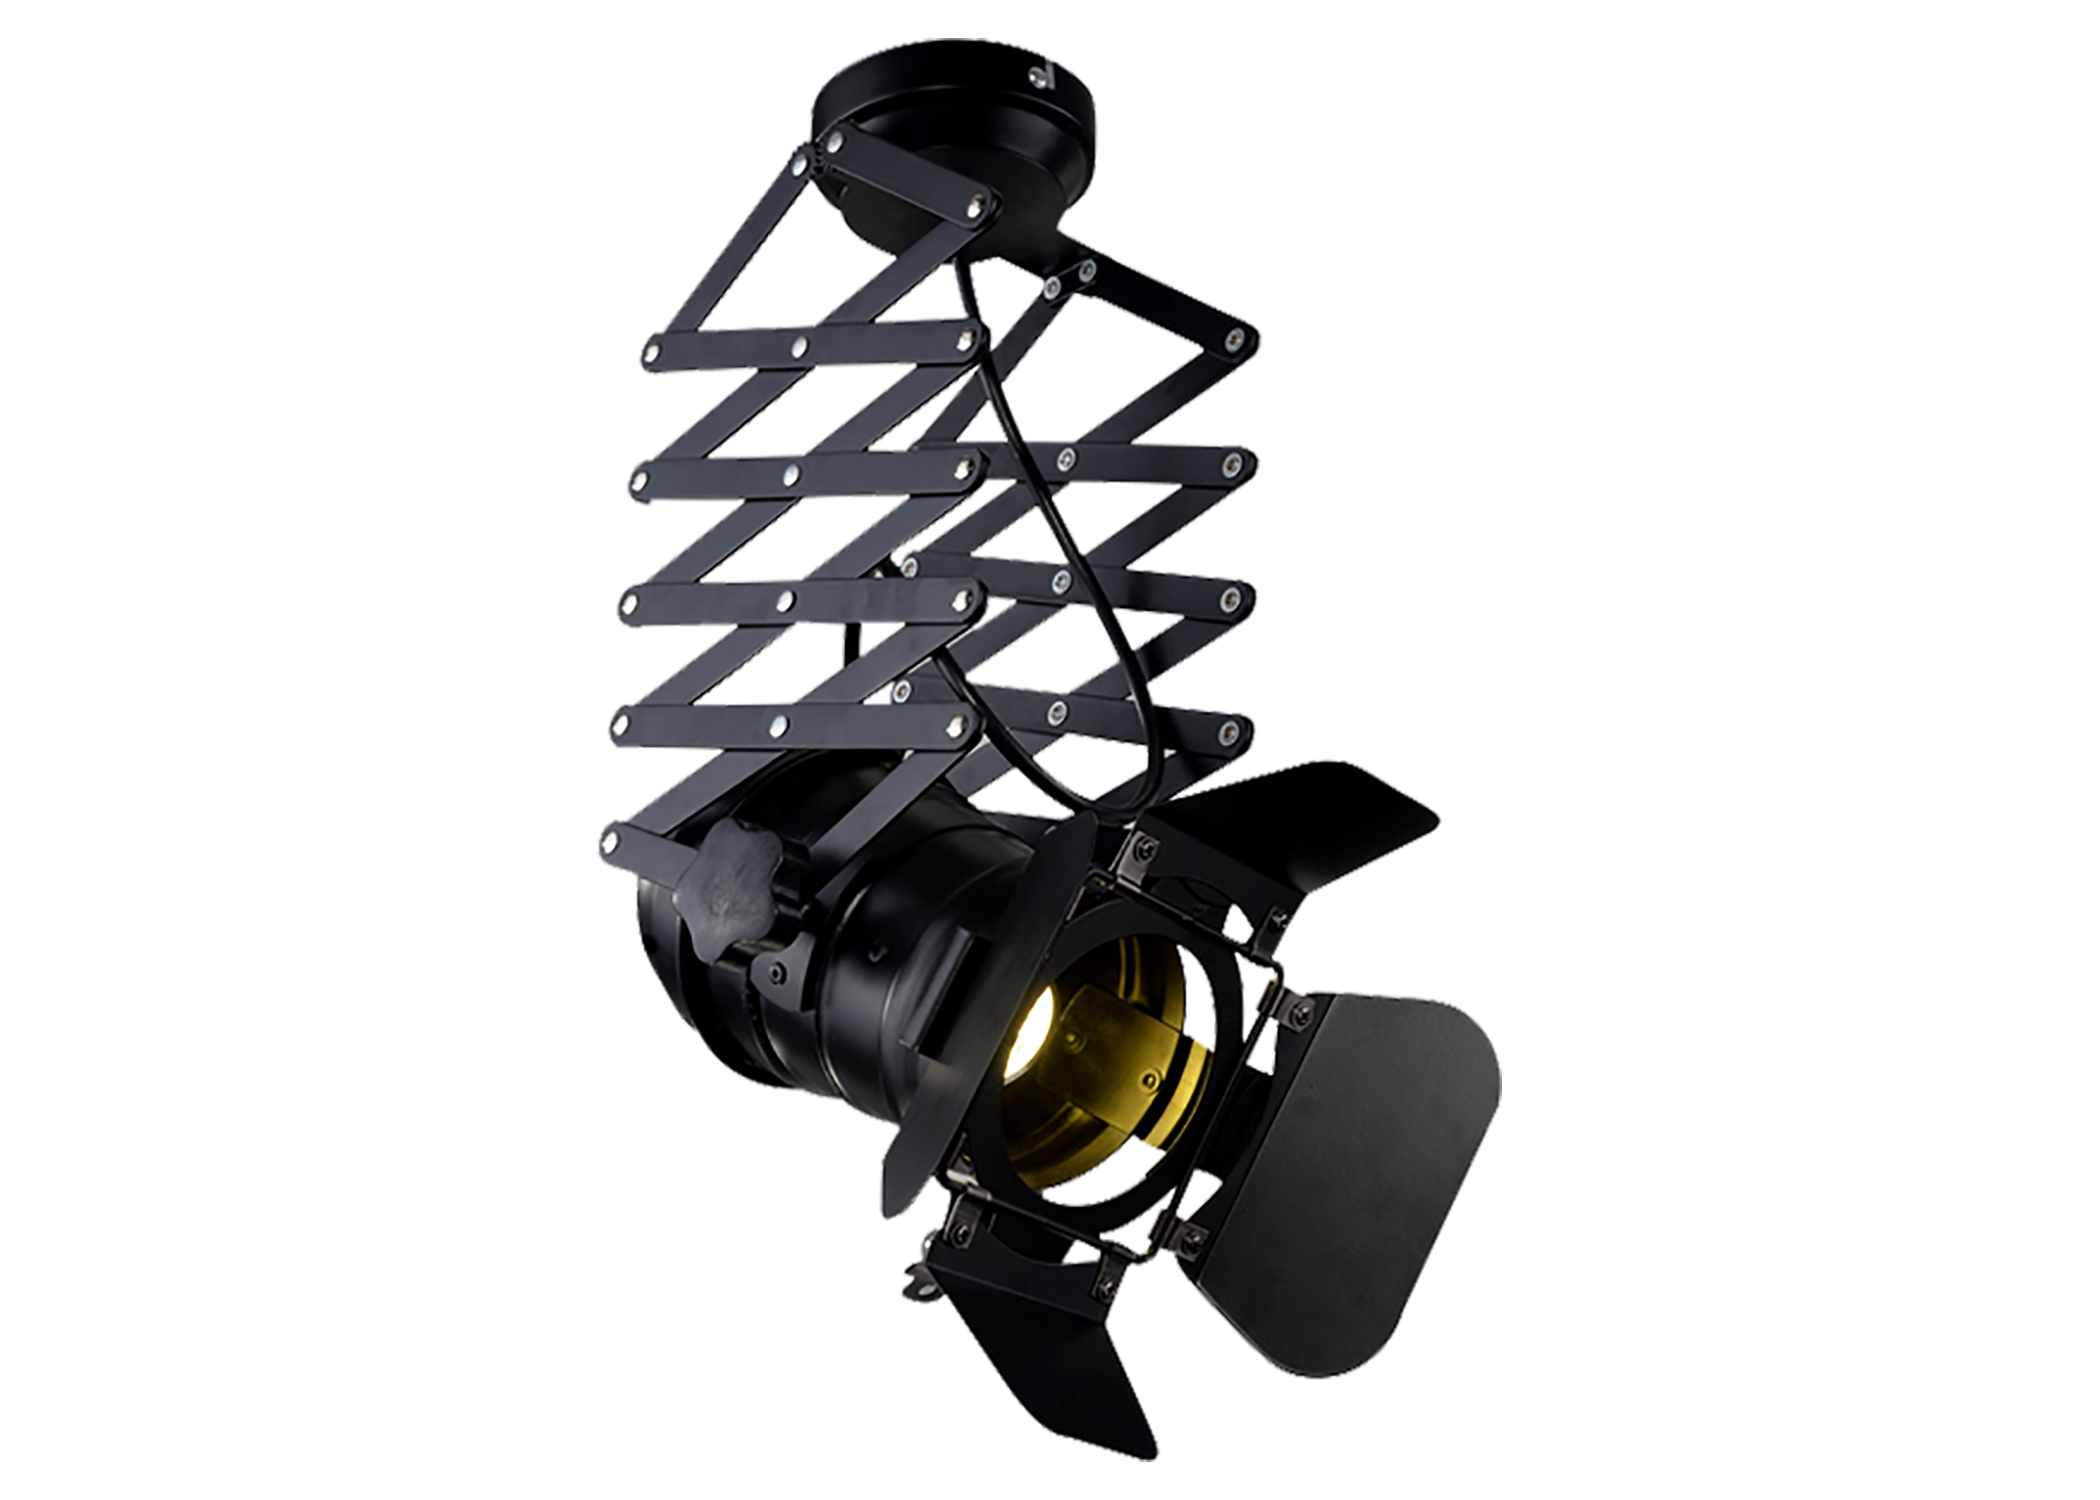 Подвесной светильникПодвесные светильники<br>&amp;lt;div&amp;gt;Цоколь: E27&amp;lt;/div&amp;gt;&amp;lt;div&amp;gt;Мощность ламп: 60W&amp;lt;/div&amp;gt;&amp;lt;div&amp;gt;Количество лампочек: 1&amp;amp;nbsp;&amp;lt;span style=&amp;quot;line-height: 1.78571;&amp;quot;&amp;gt;(в комплекте)&amp;lt;/span&amp;gt;&amp;lt;/div&amp;gt;<br><br>Material: Металл<br>Length см: None<br>Width см: 31<br>Depth см: 17<br>Height см: 85